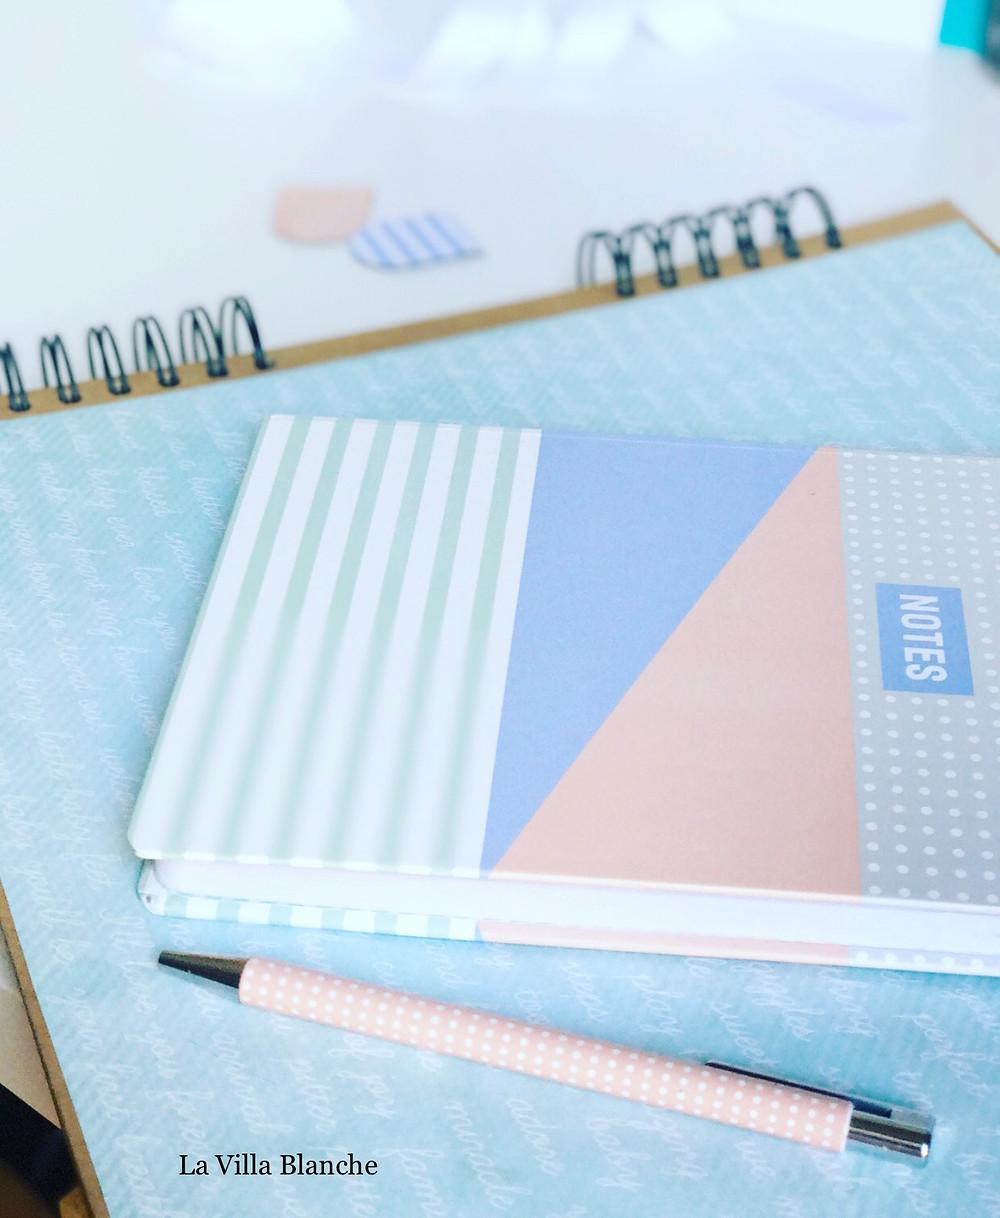 Journals & Notes